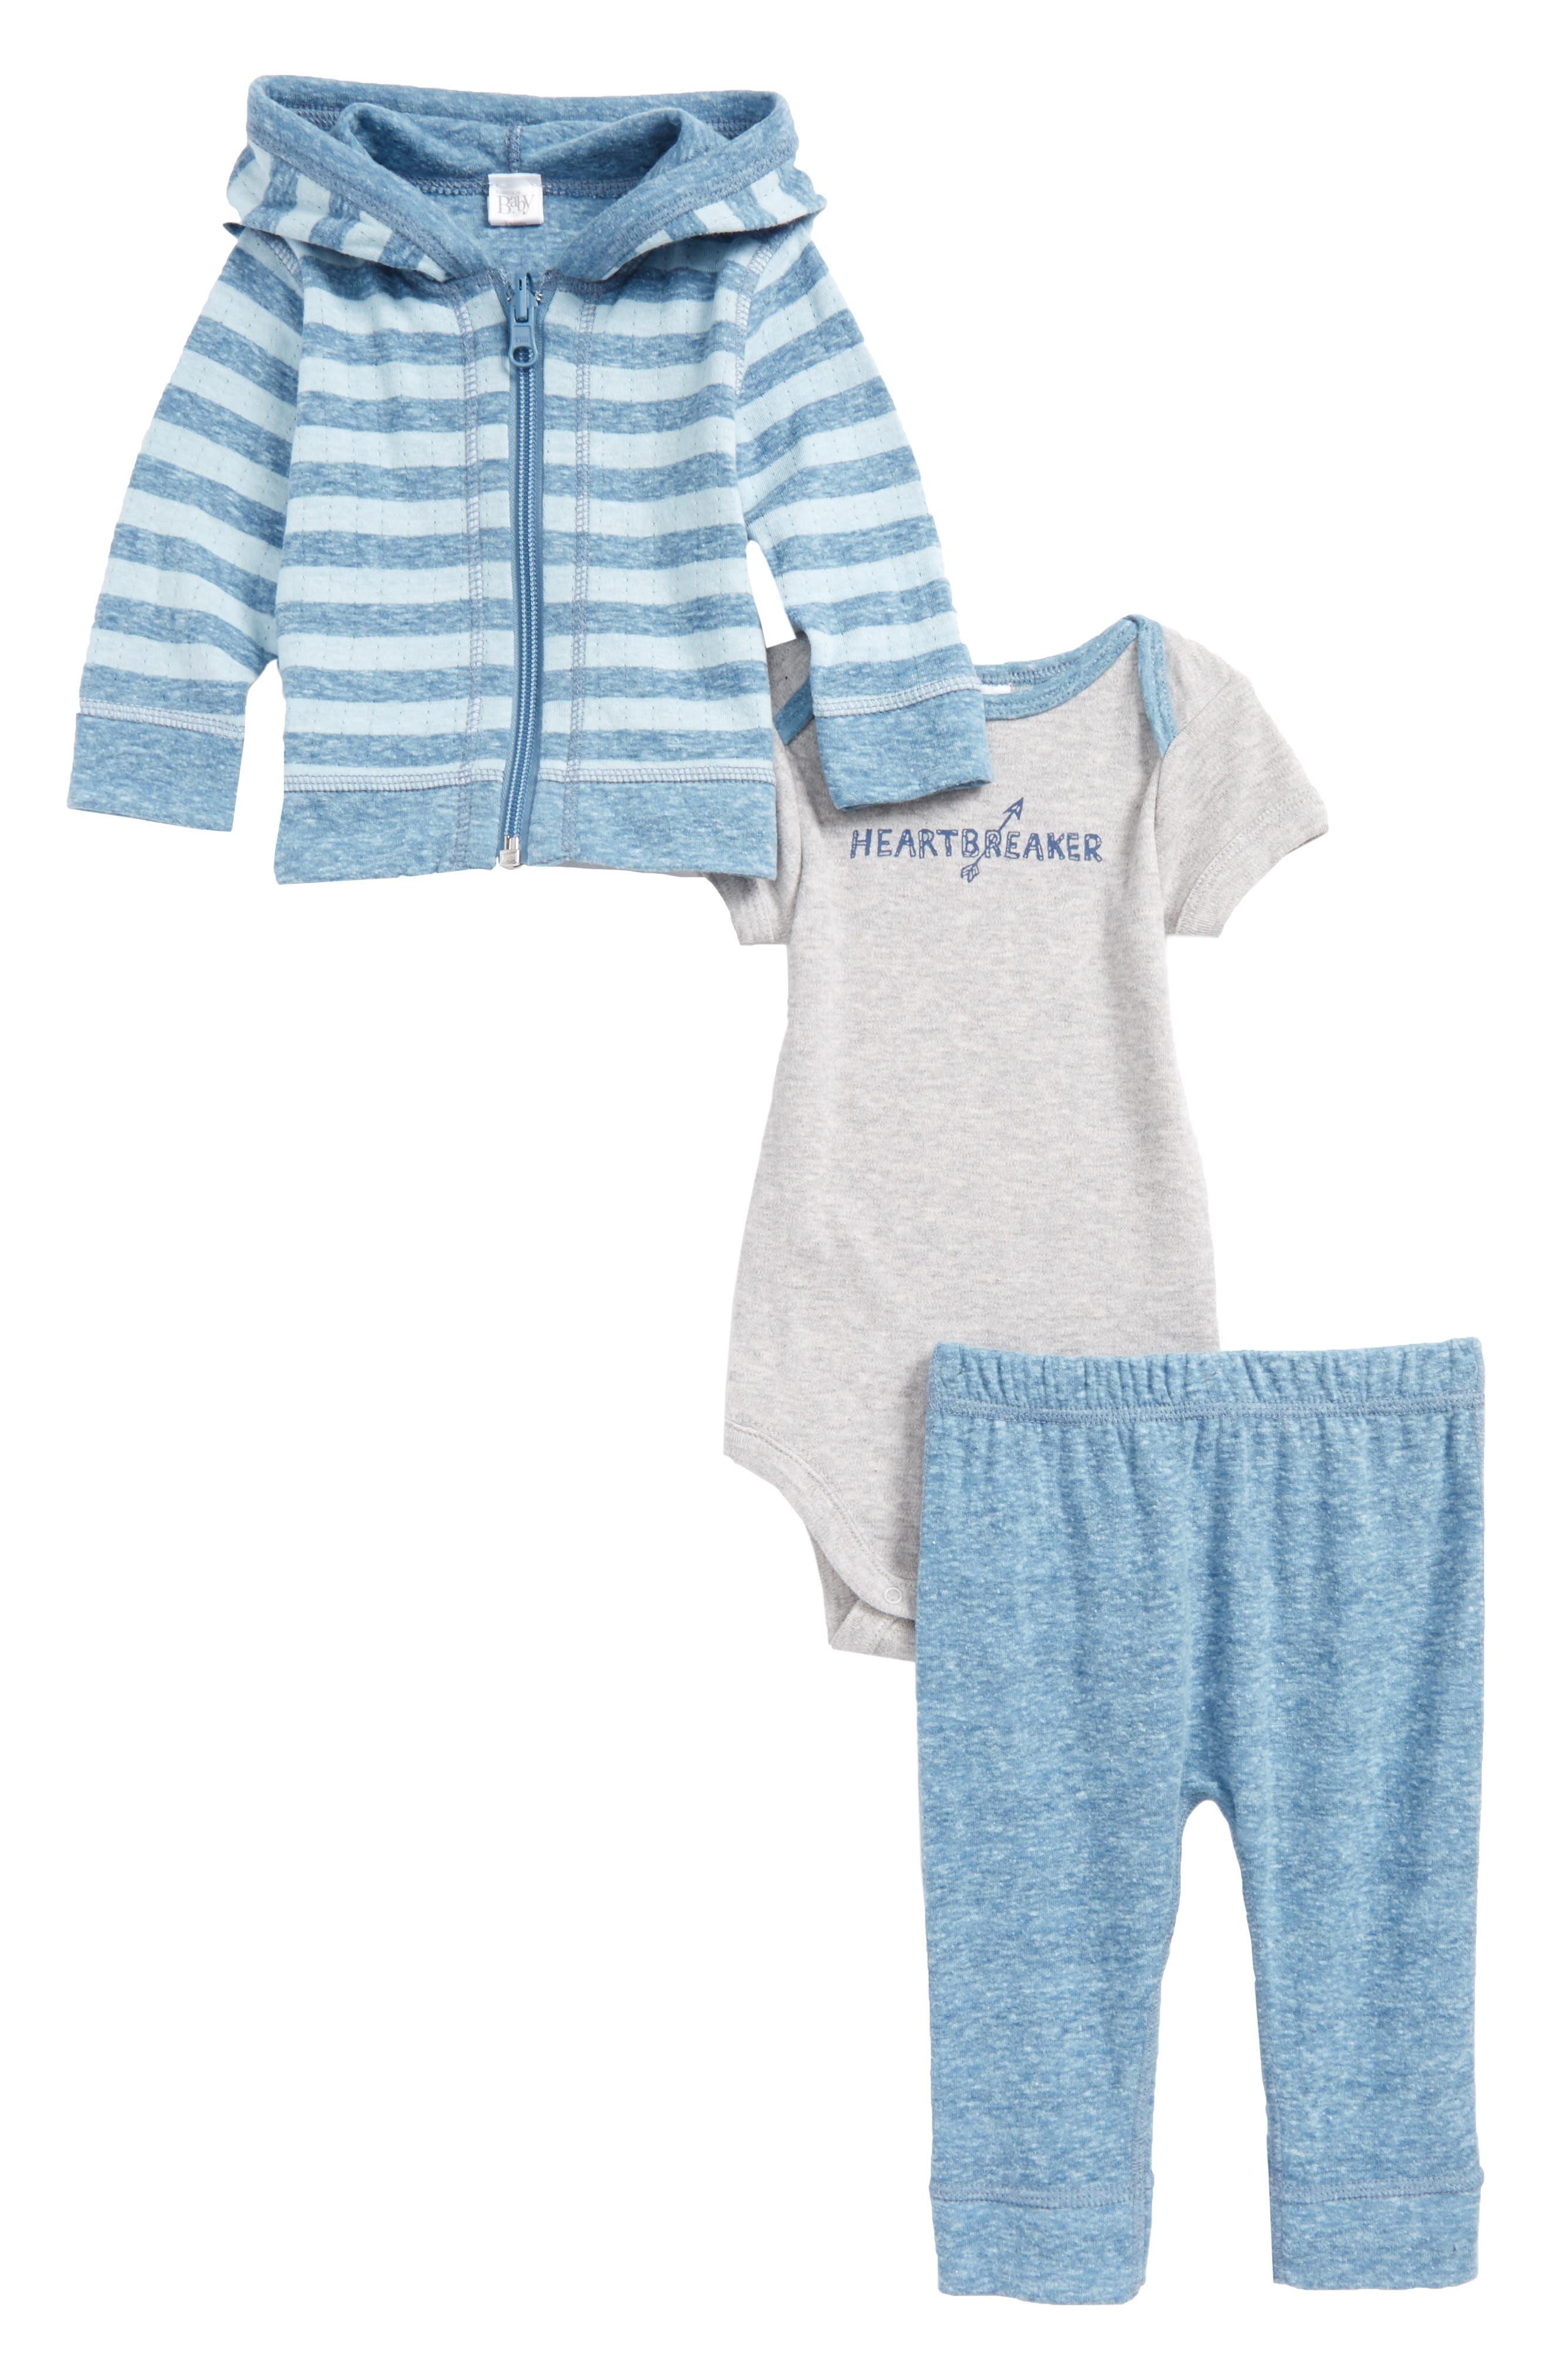 NORDSTROM BABY,                             Reversible Zip Hoodie, Bodysuit & Pants Set,                             Main thumbnail 1, color,                             401